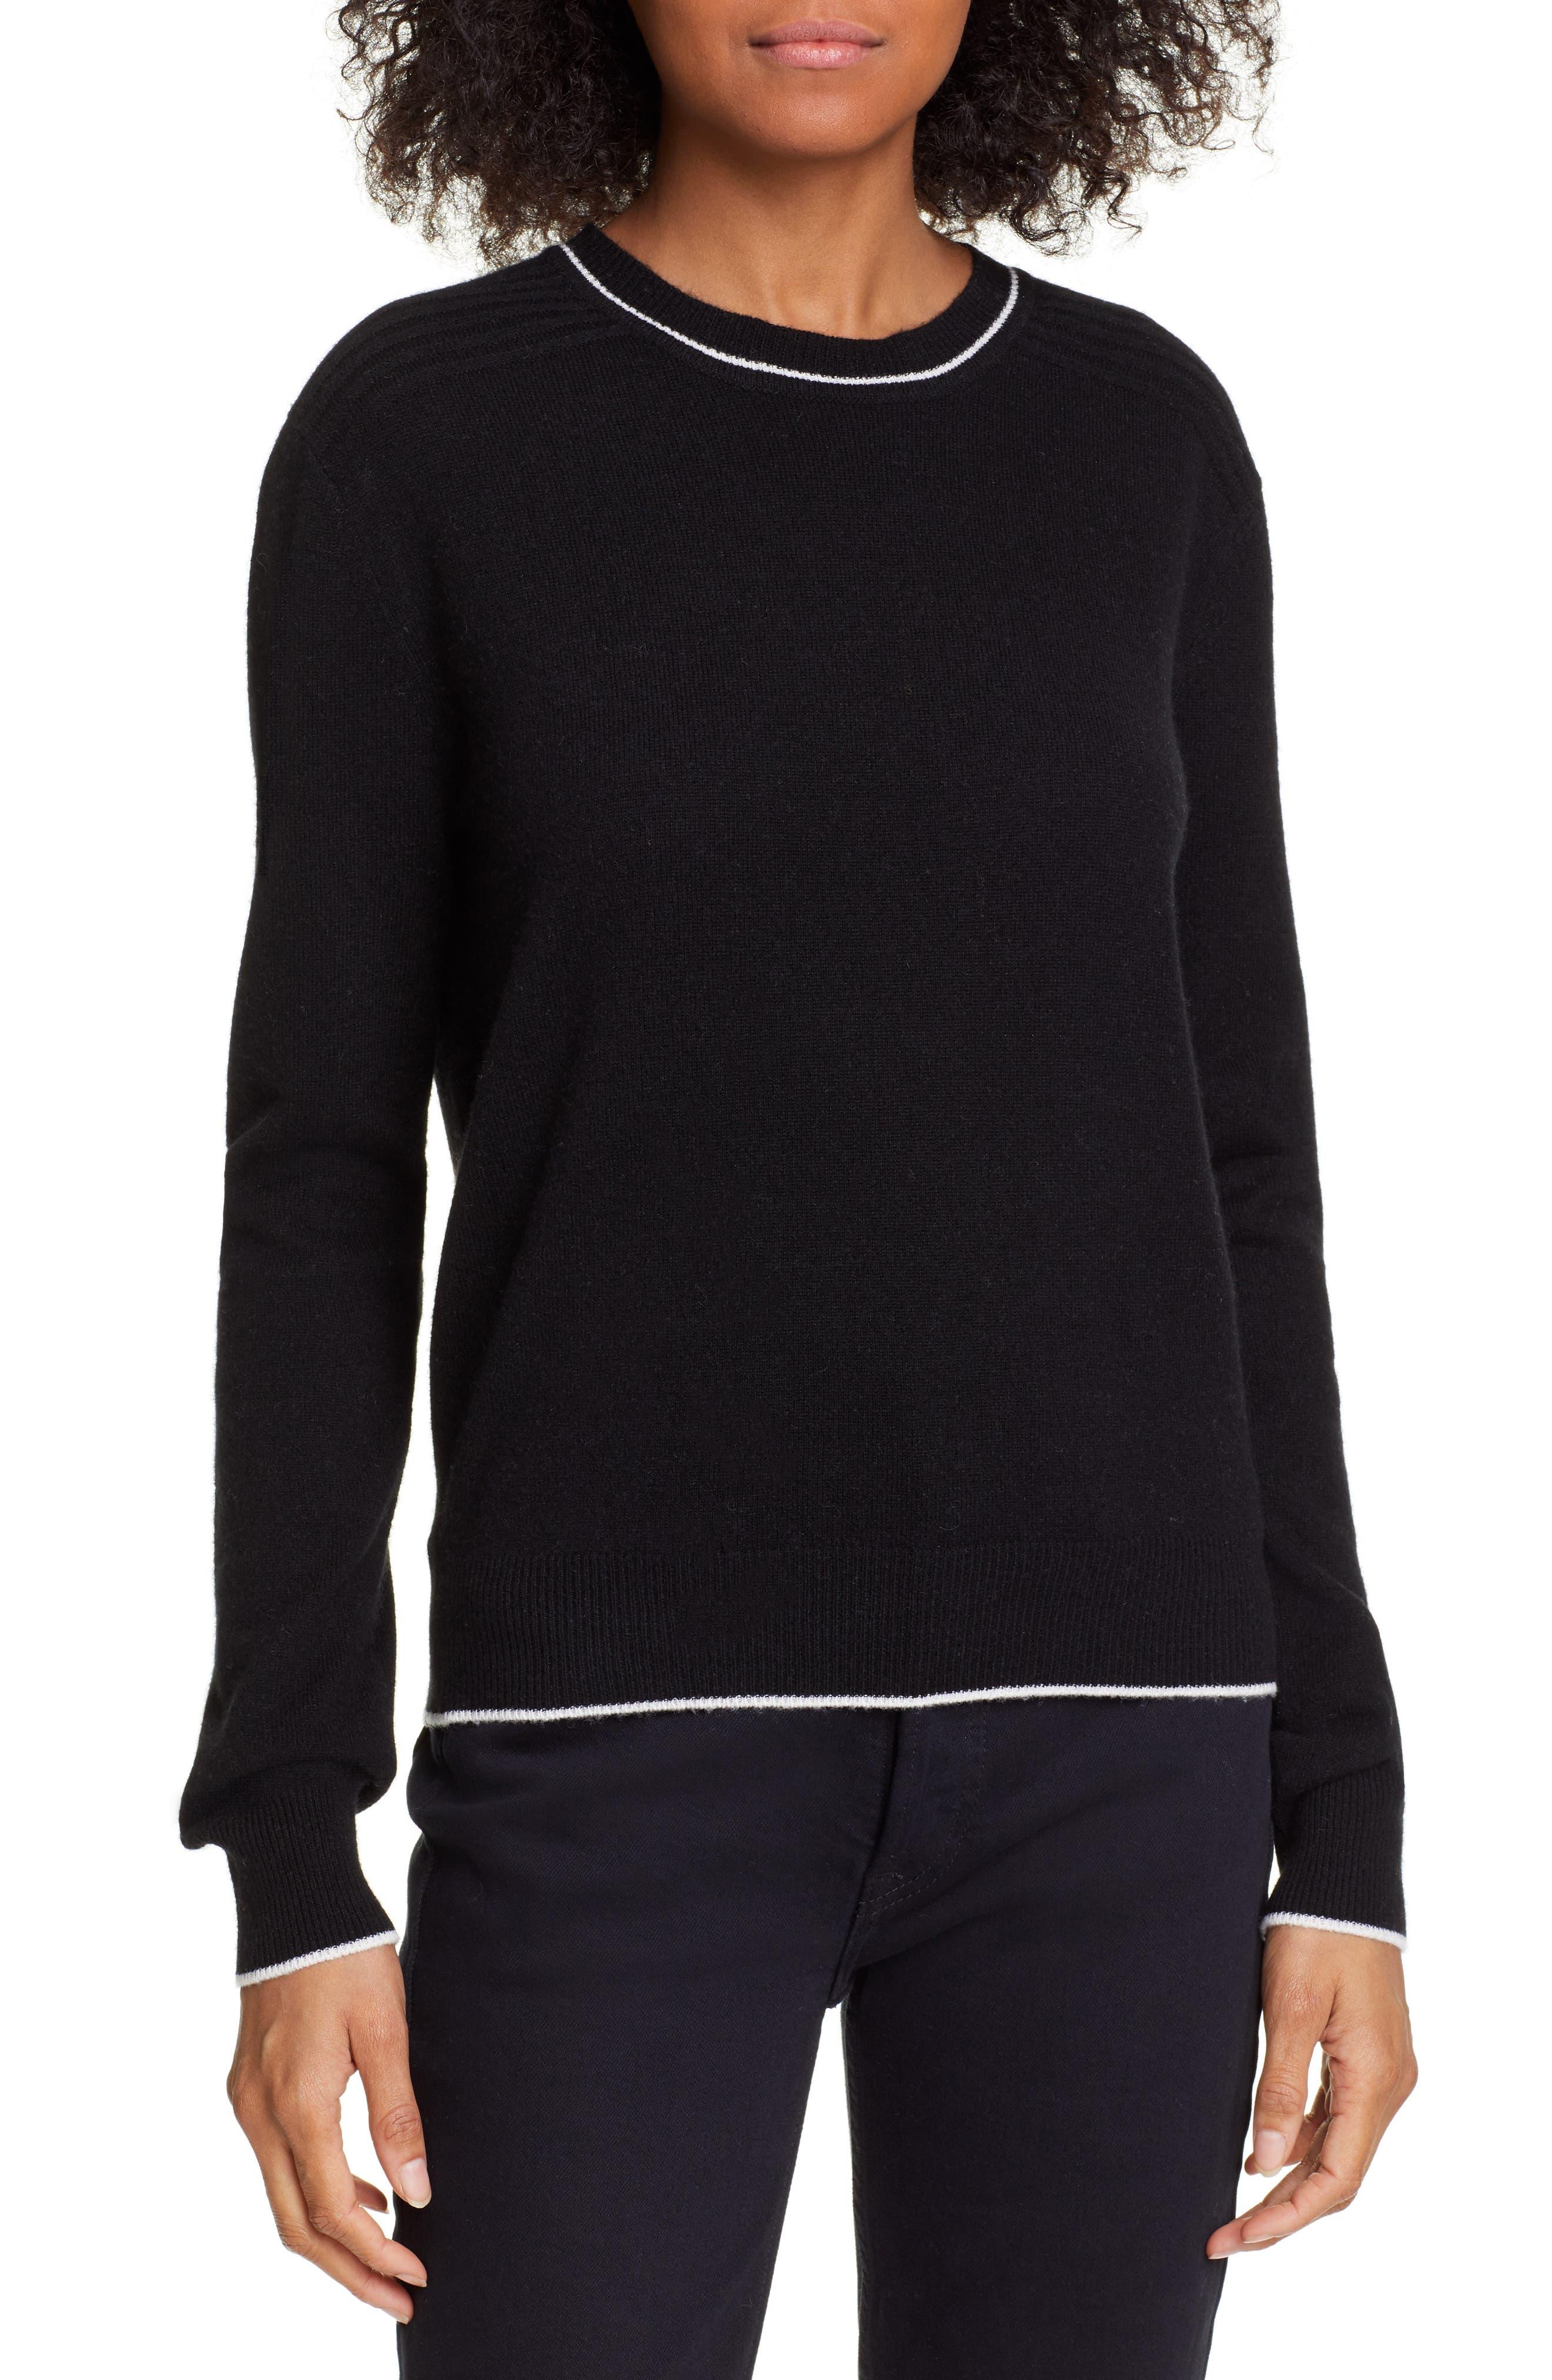 La Ligne Neat Wool & Cashmere Sweater, Black